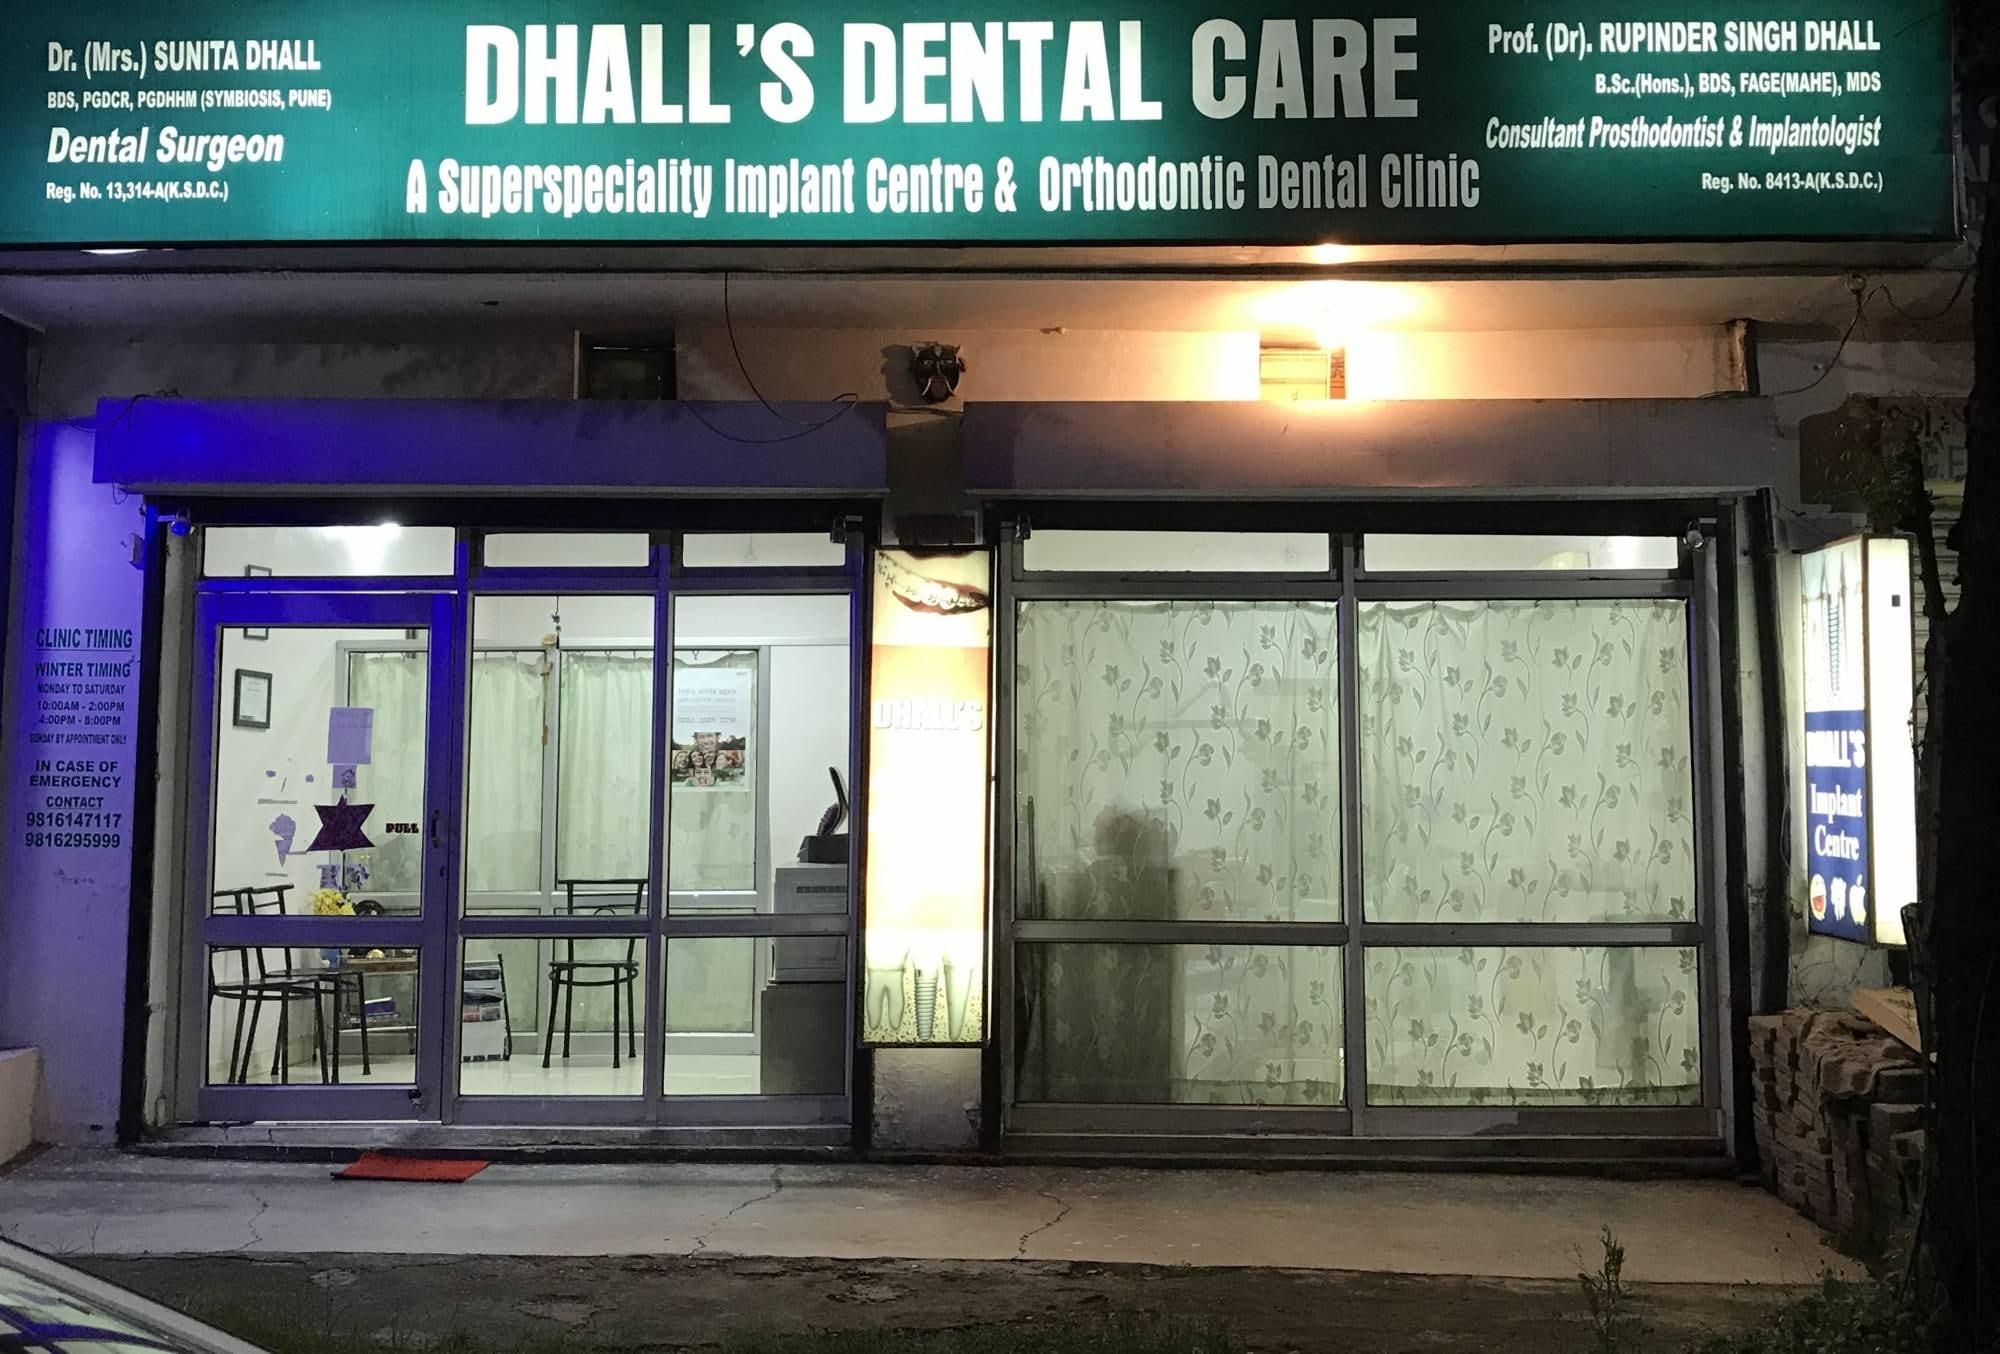 Top 10 Dentists in Paonta Sahib - Best Dental Clinics - Book